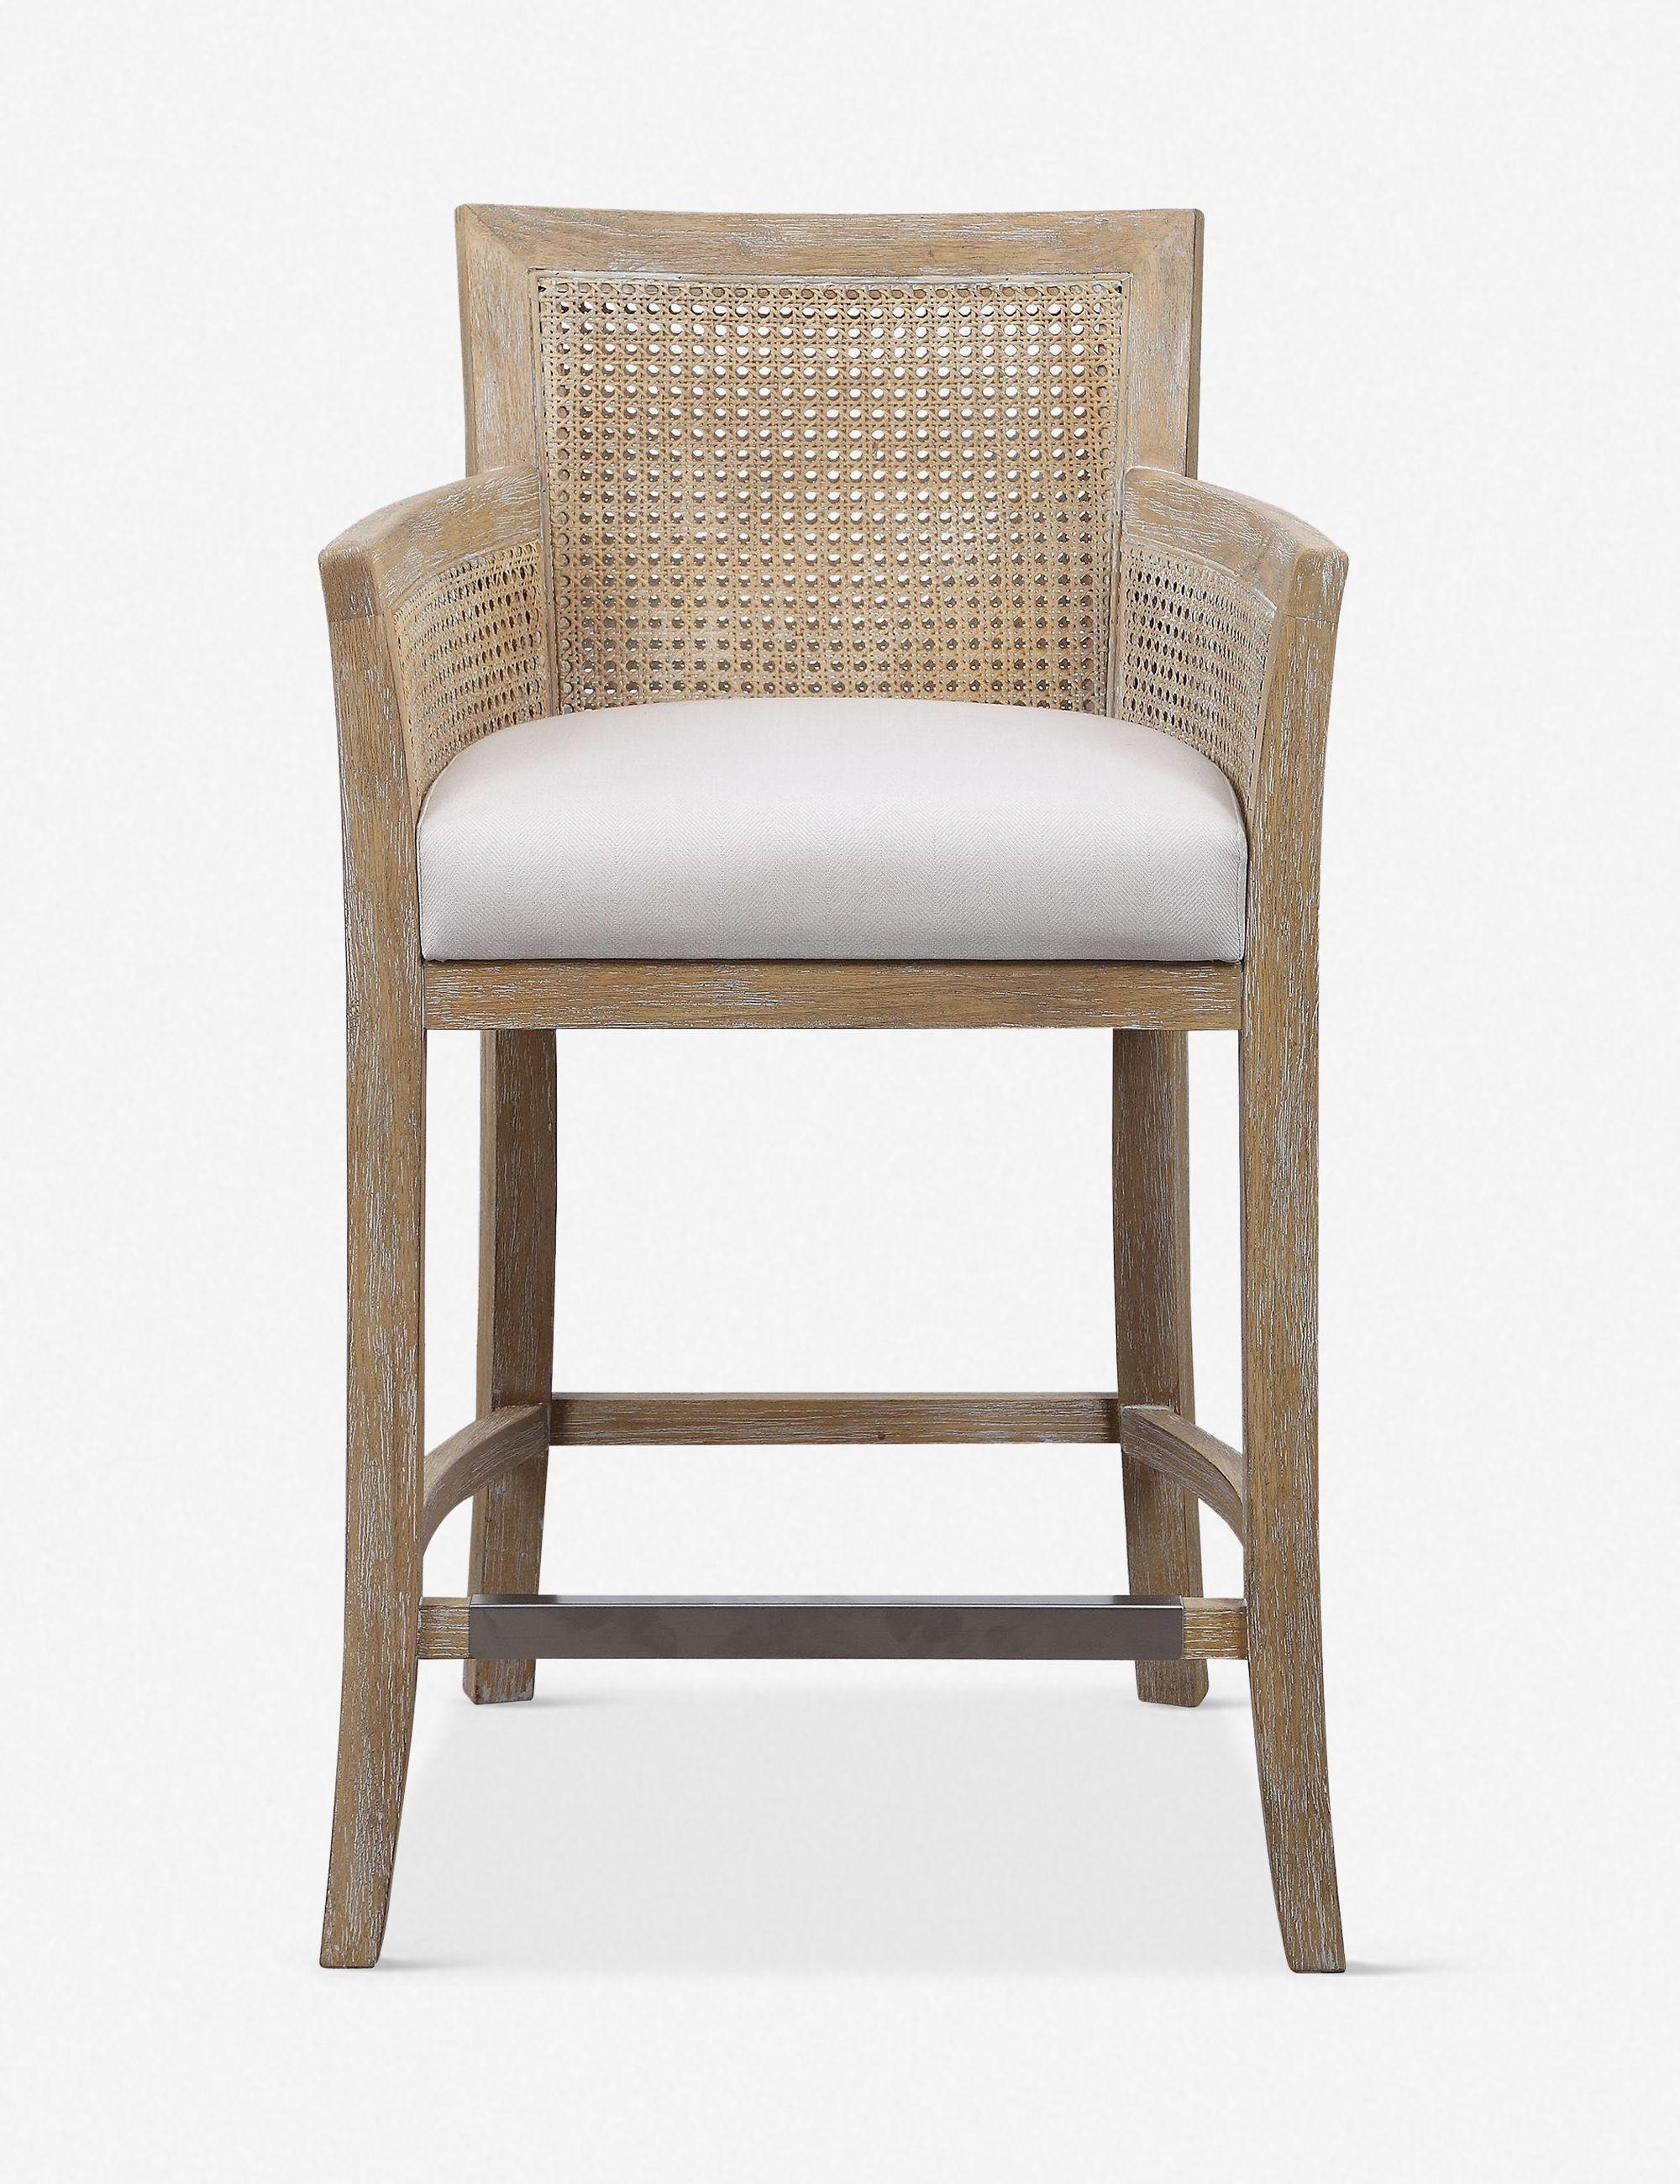 Bar Stools And High Table, Seagrass Barstool Bar Height Gray Wash Furniture Bar Counter Stools Pottery Barn Vozeli Com